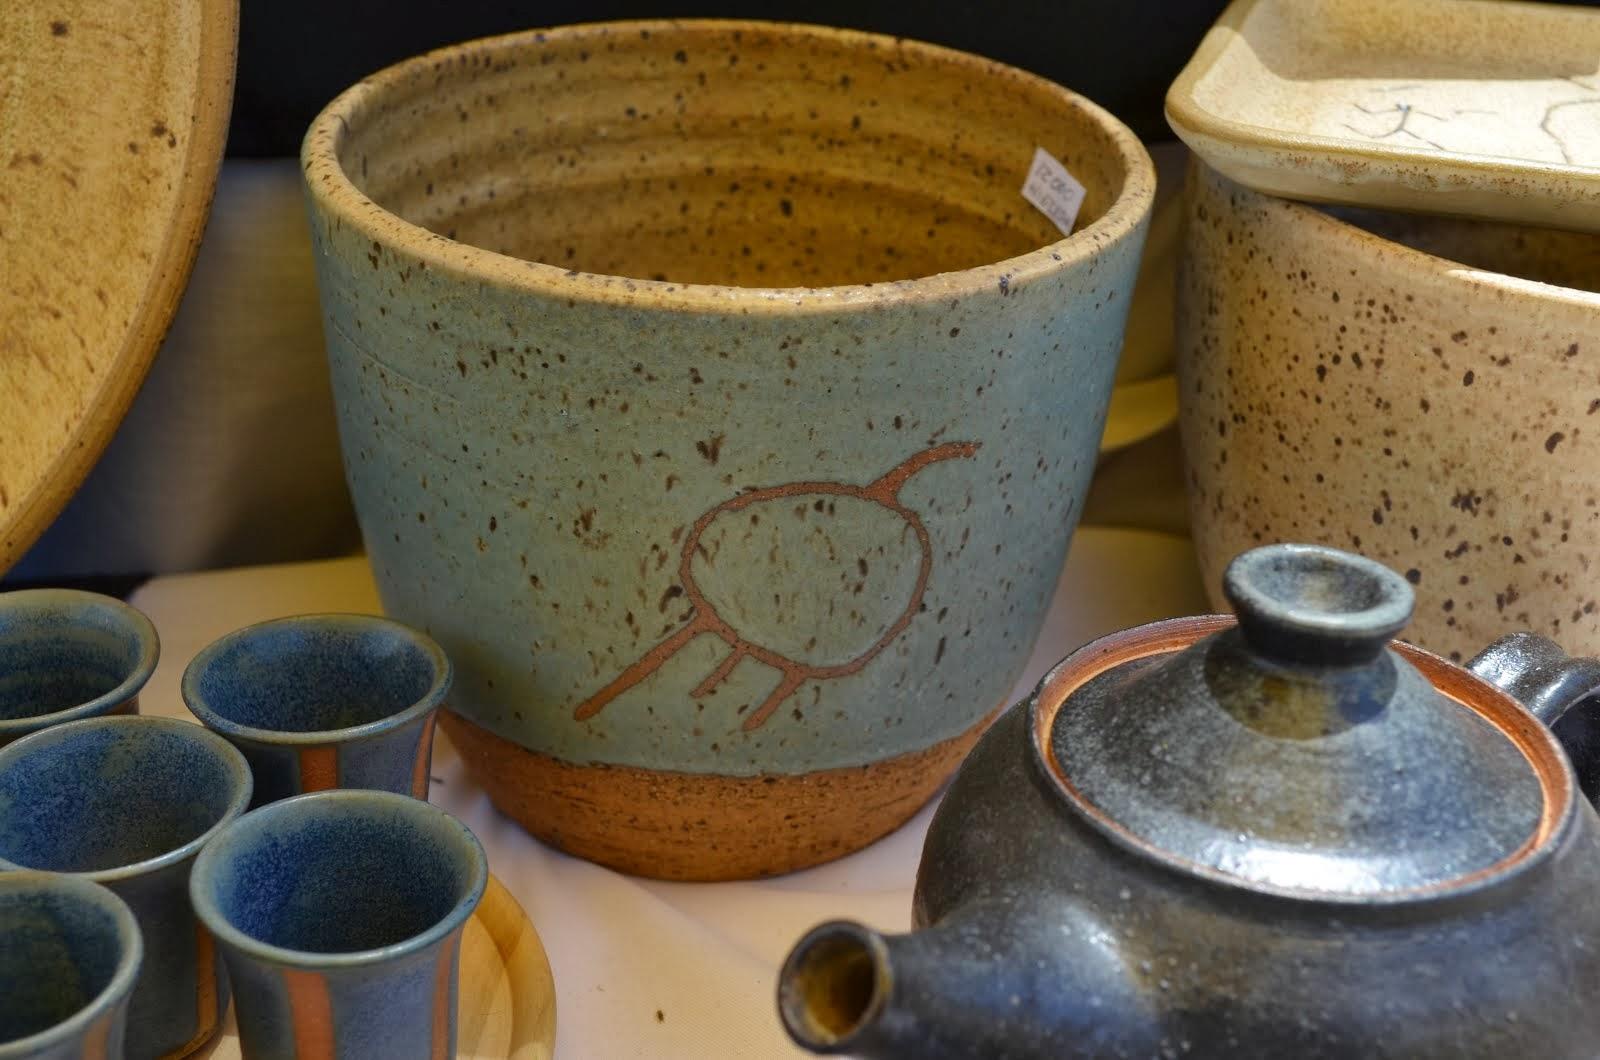 pasta para ceramica gres taller cer mica colcol santiago u oa clases cer mica